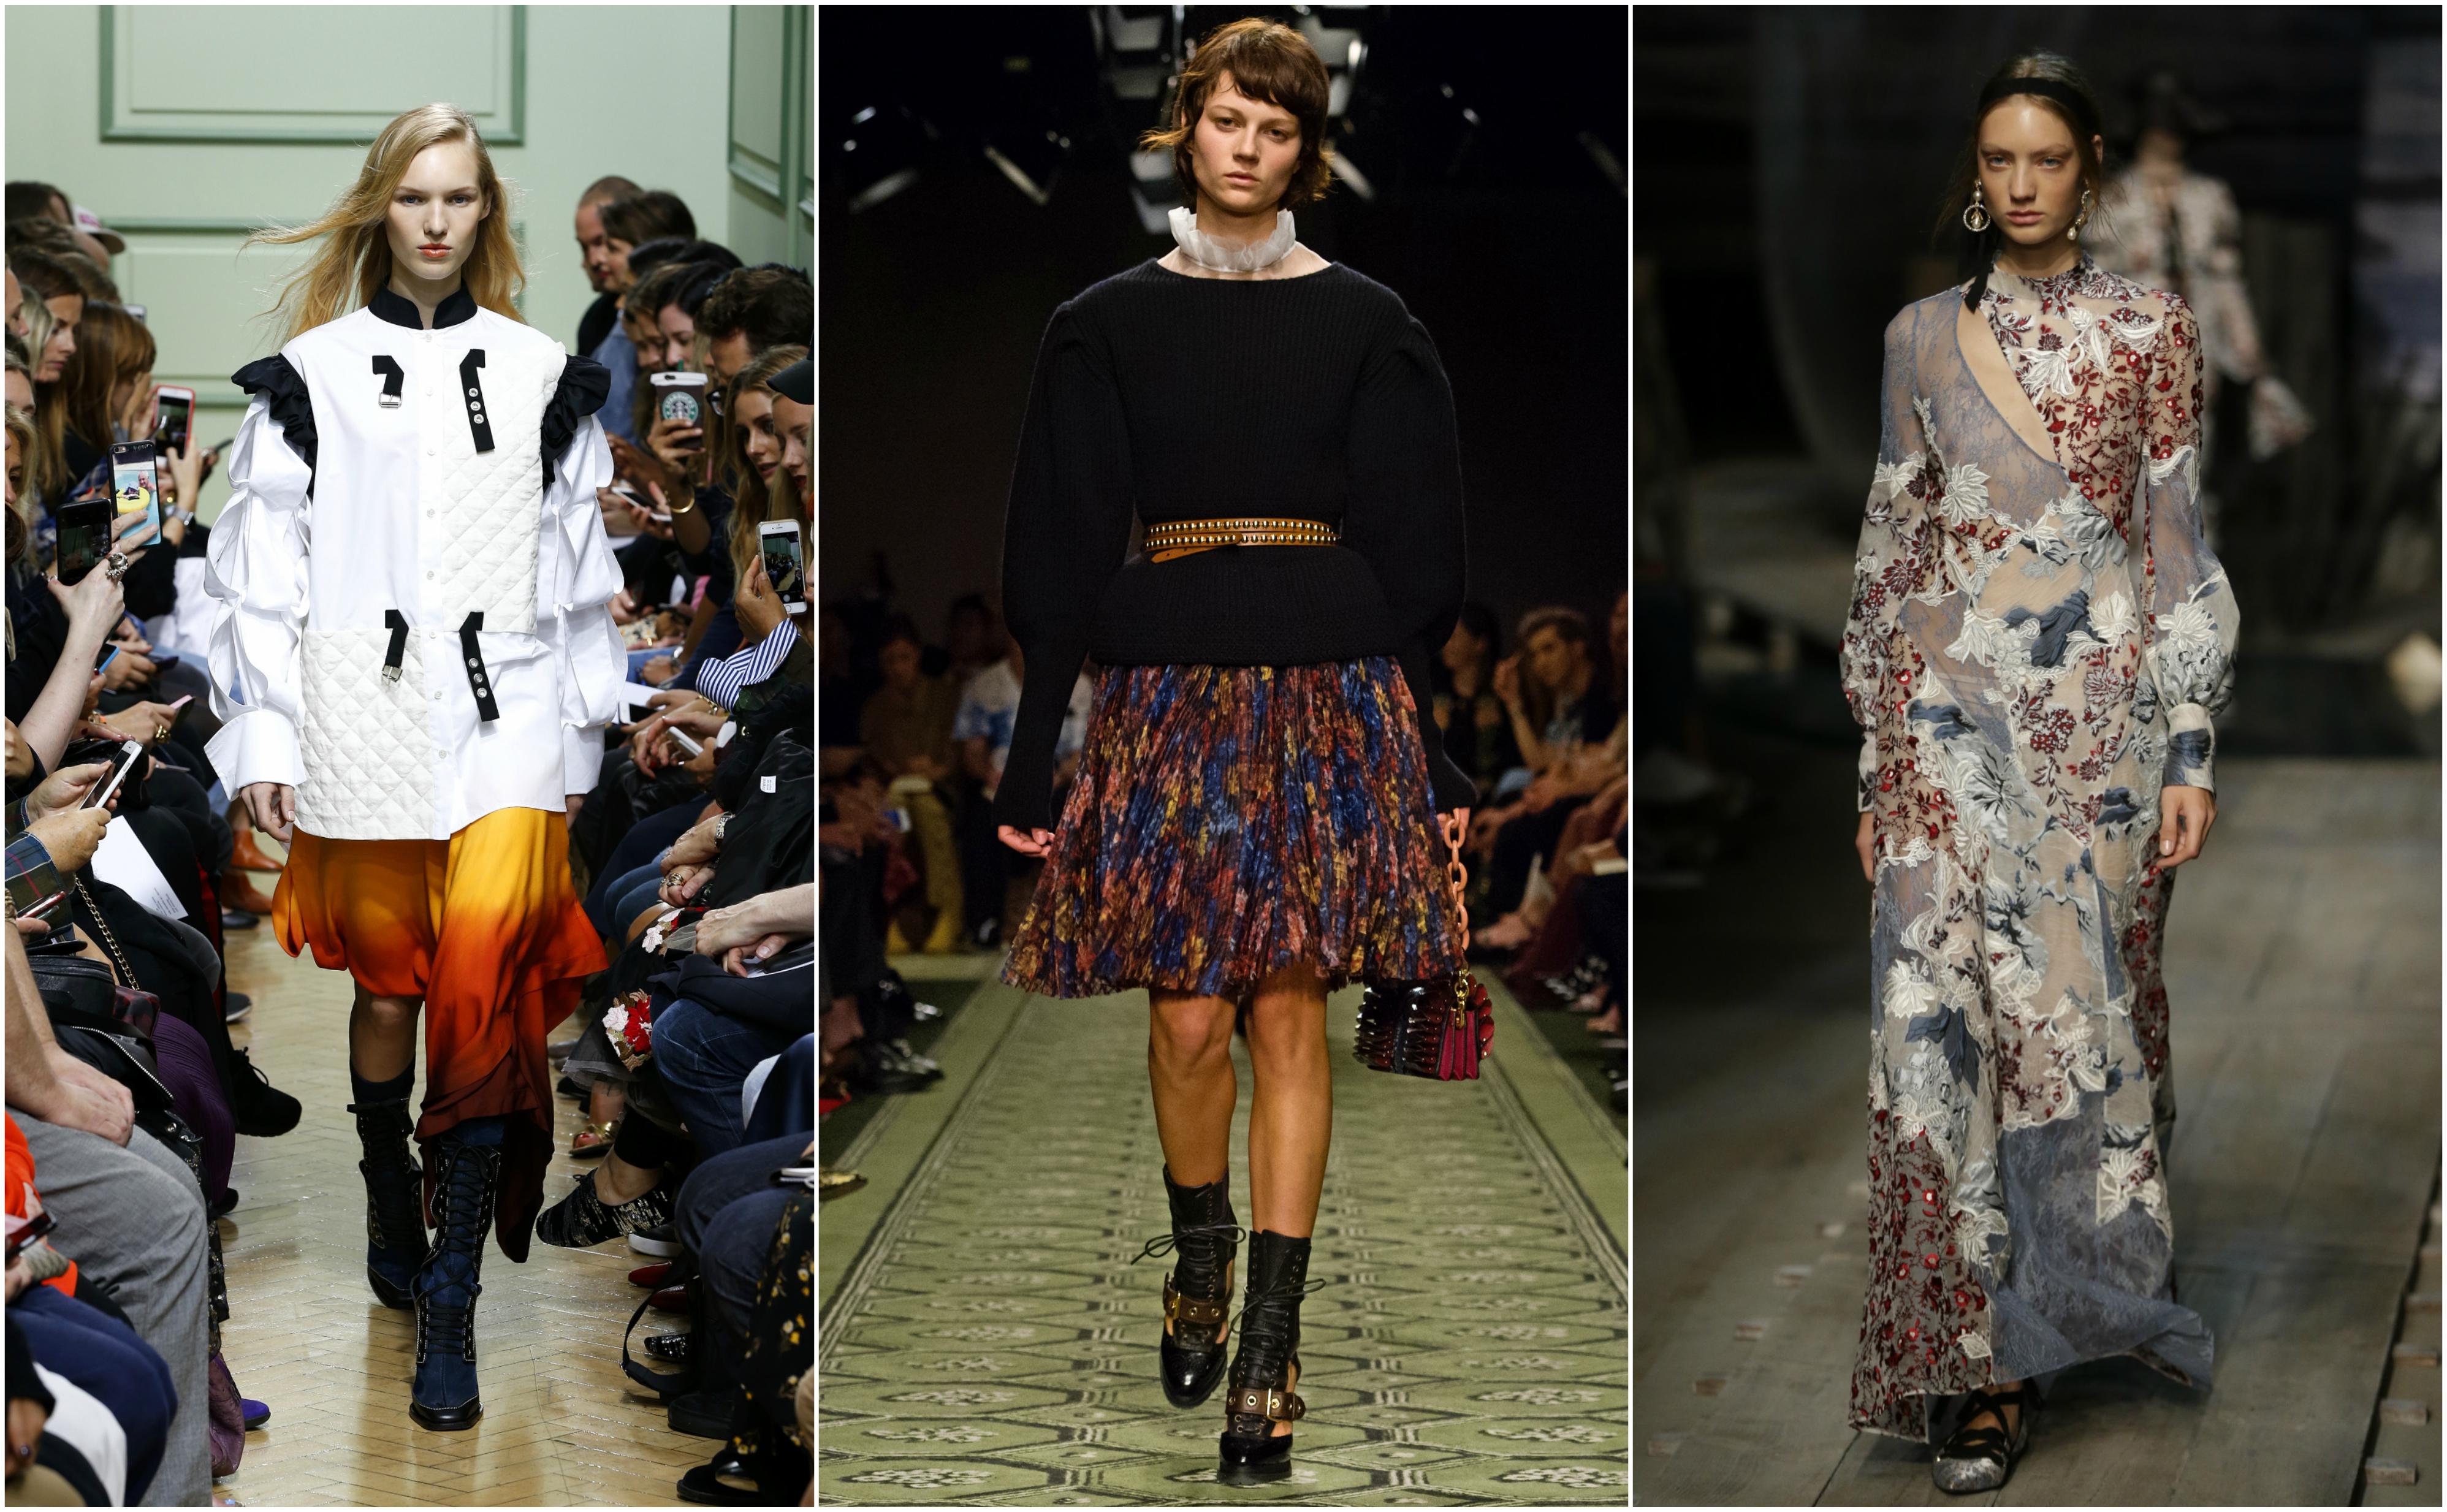 Models walk the runway at London Fashion Week in Sep. 2016